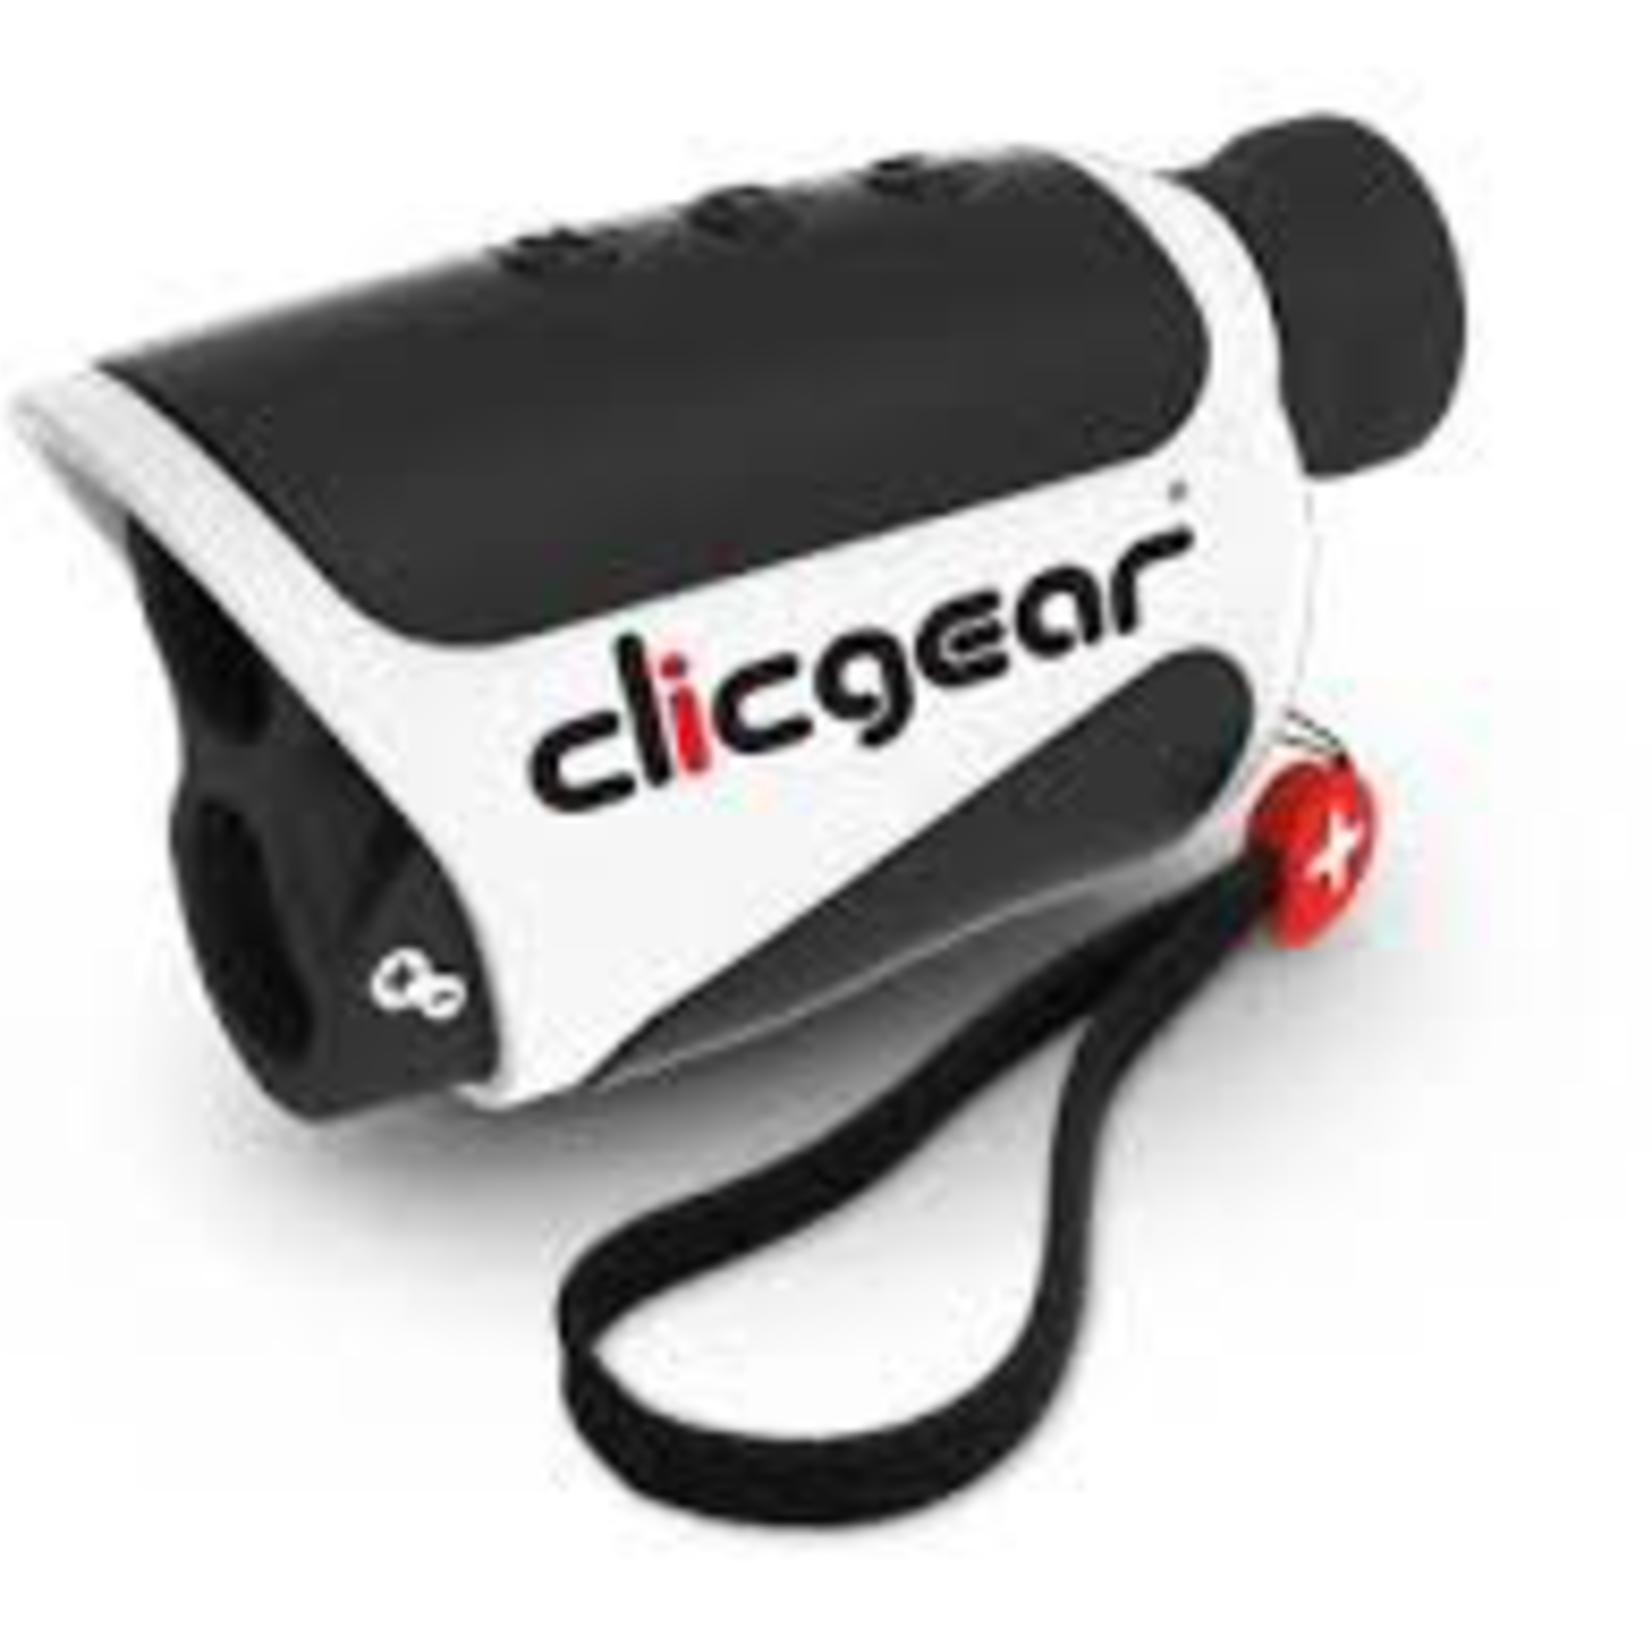 Clicgear Clic Gear Range Finder